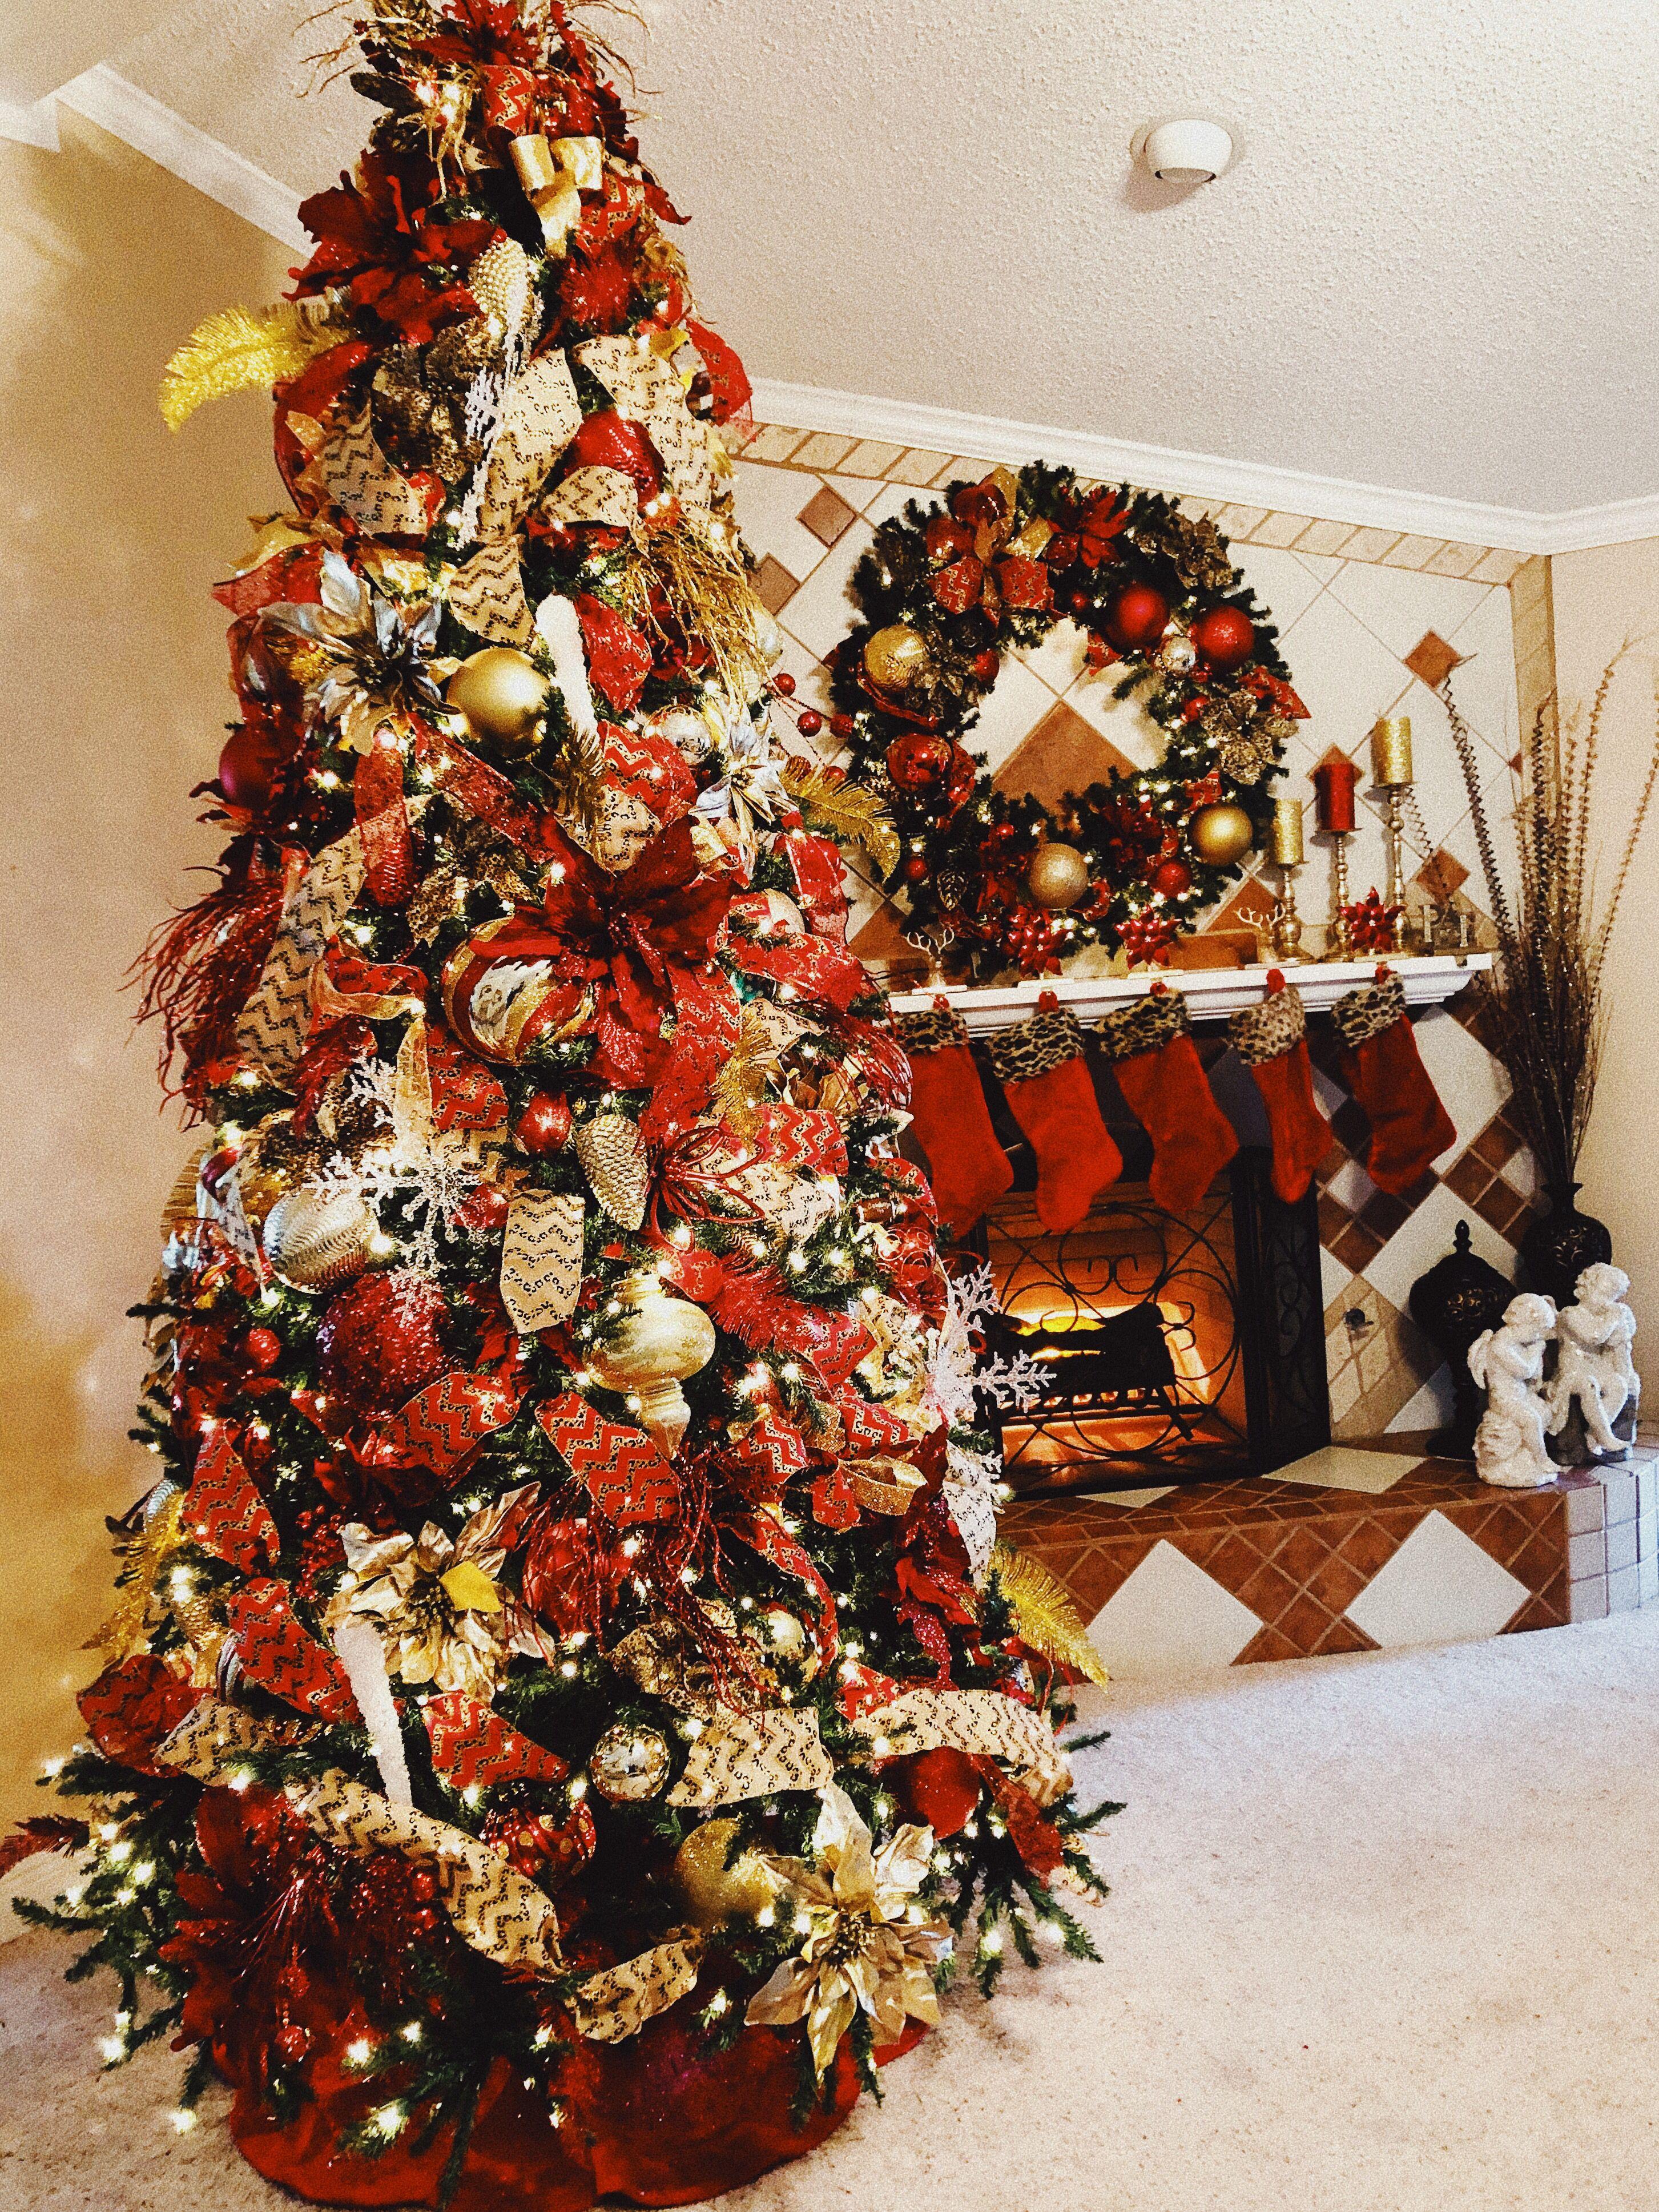 Christmas Tree Christmas Tree Christmas Decorations Tree